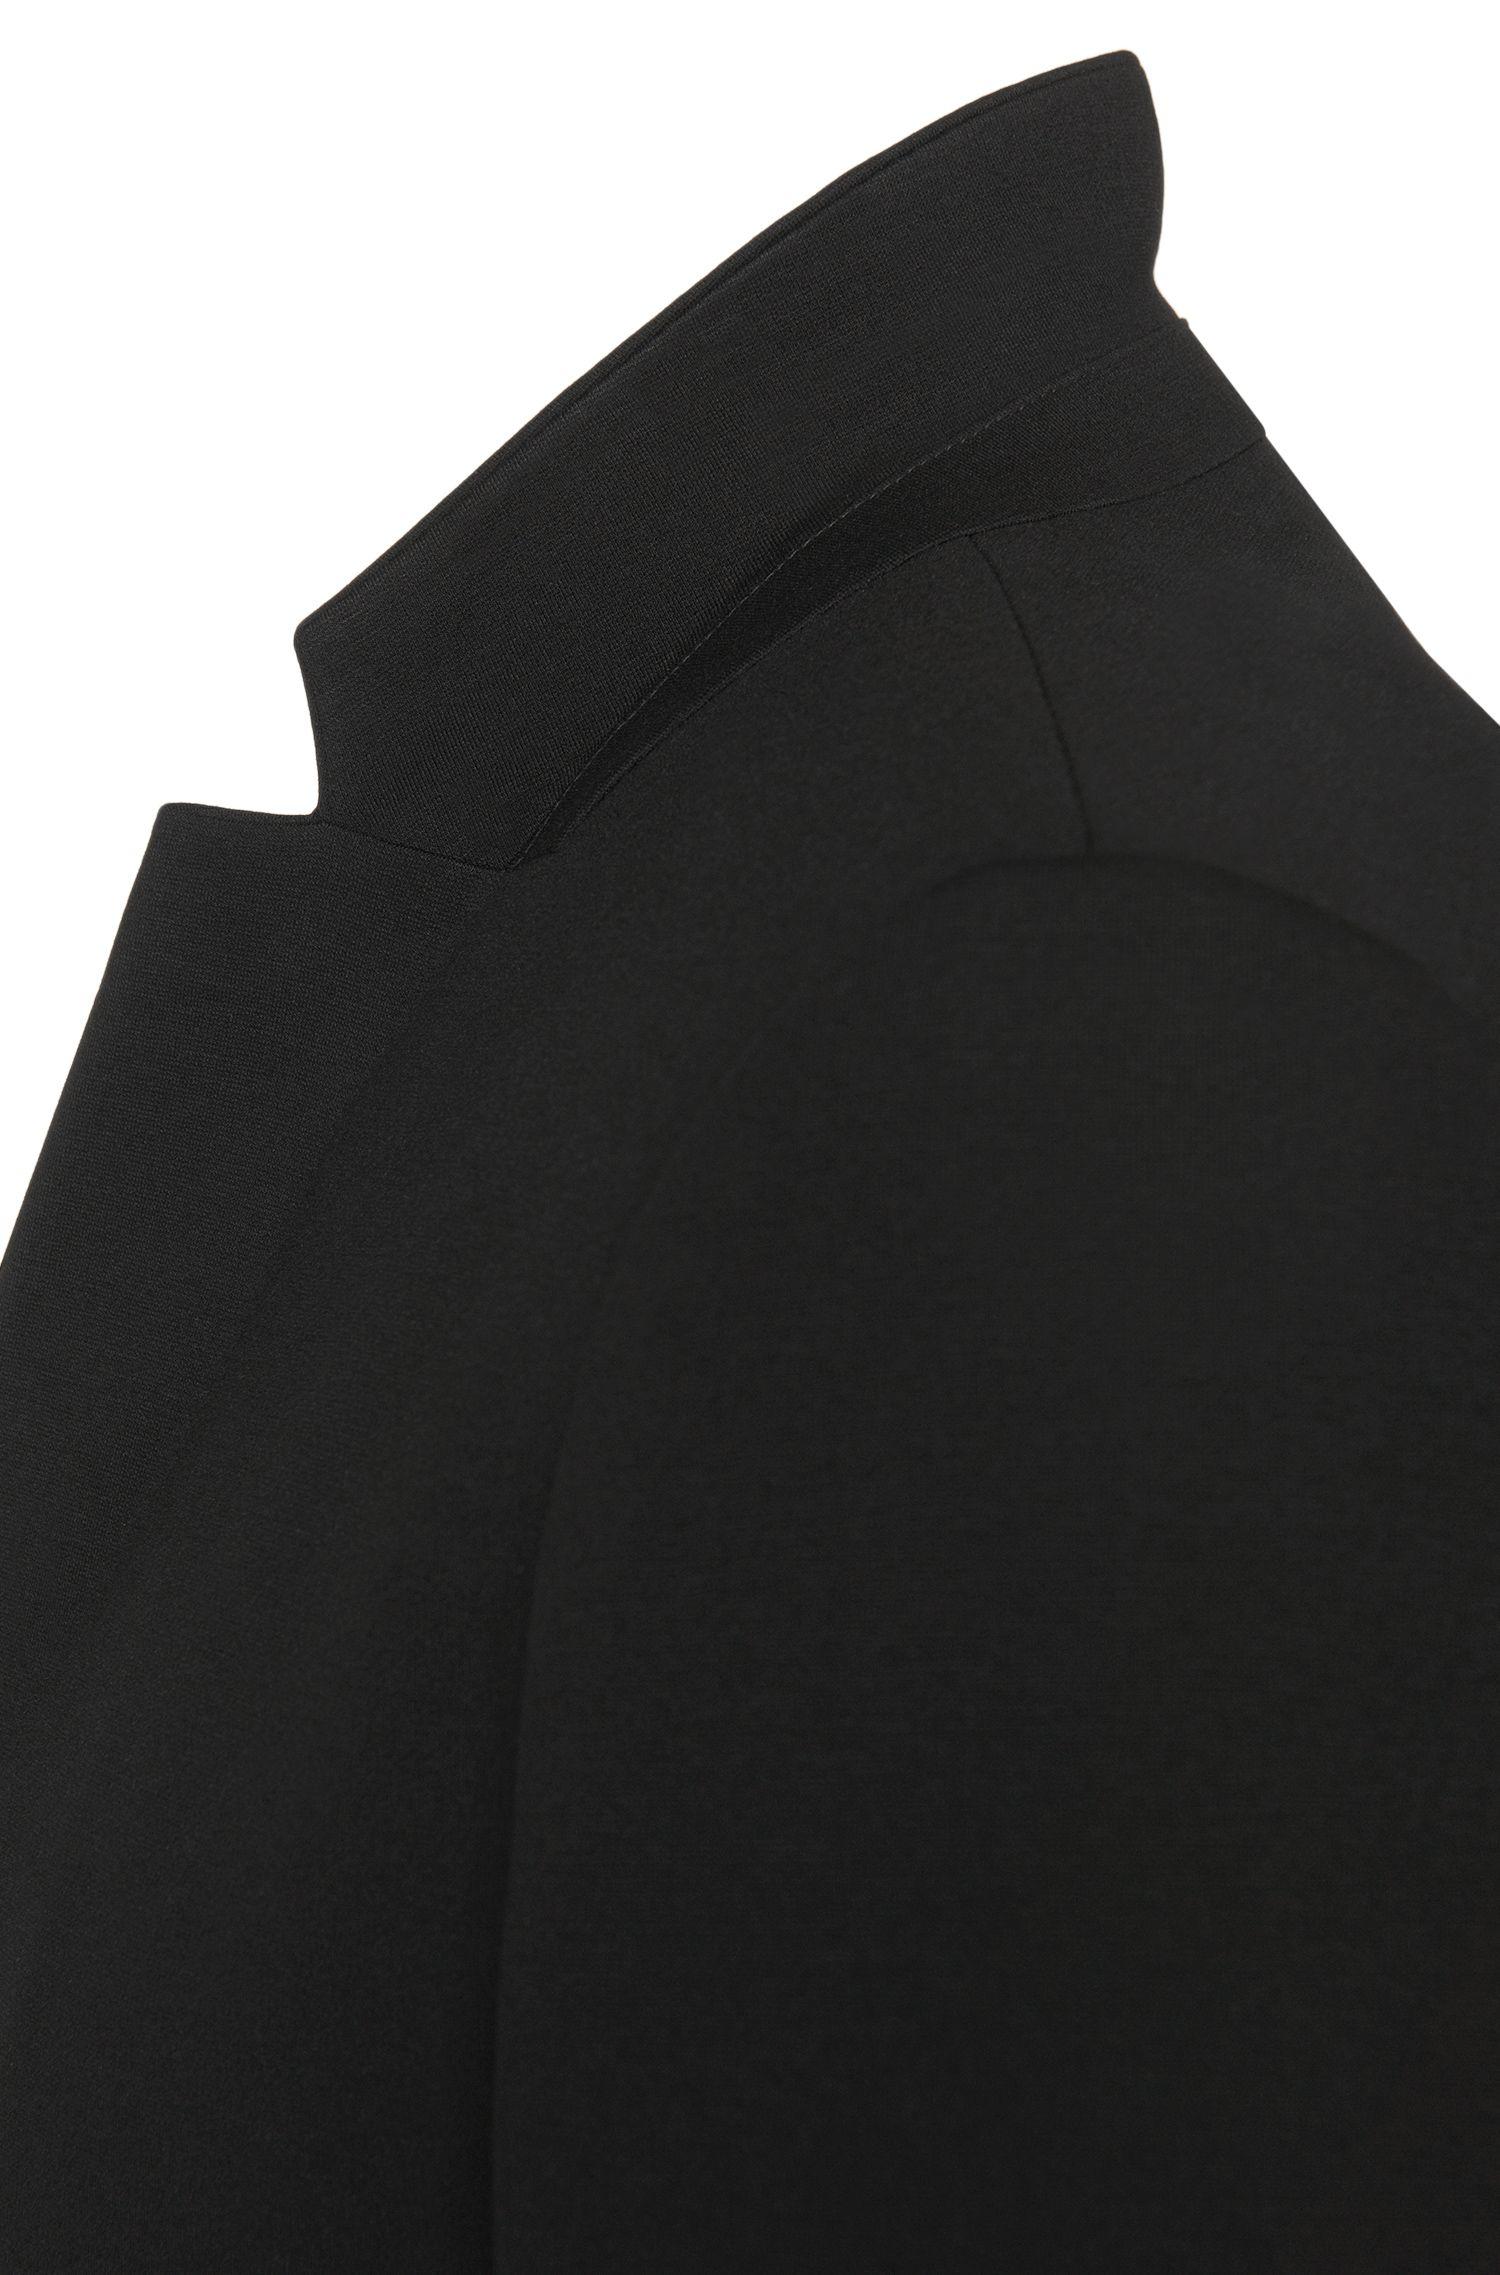 Costume Slim Fit en jersey de viscose mélangée: «Arsey/Hins»